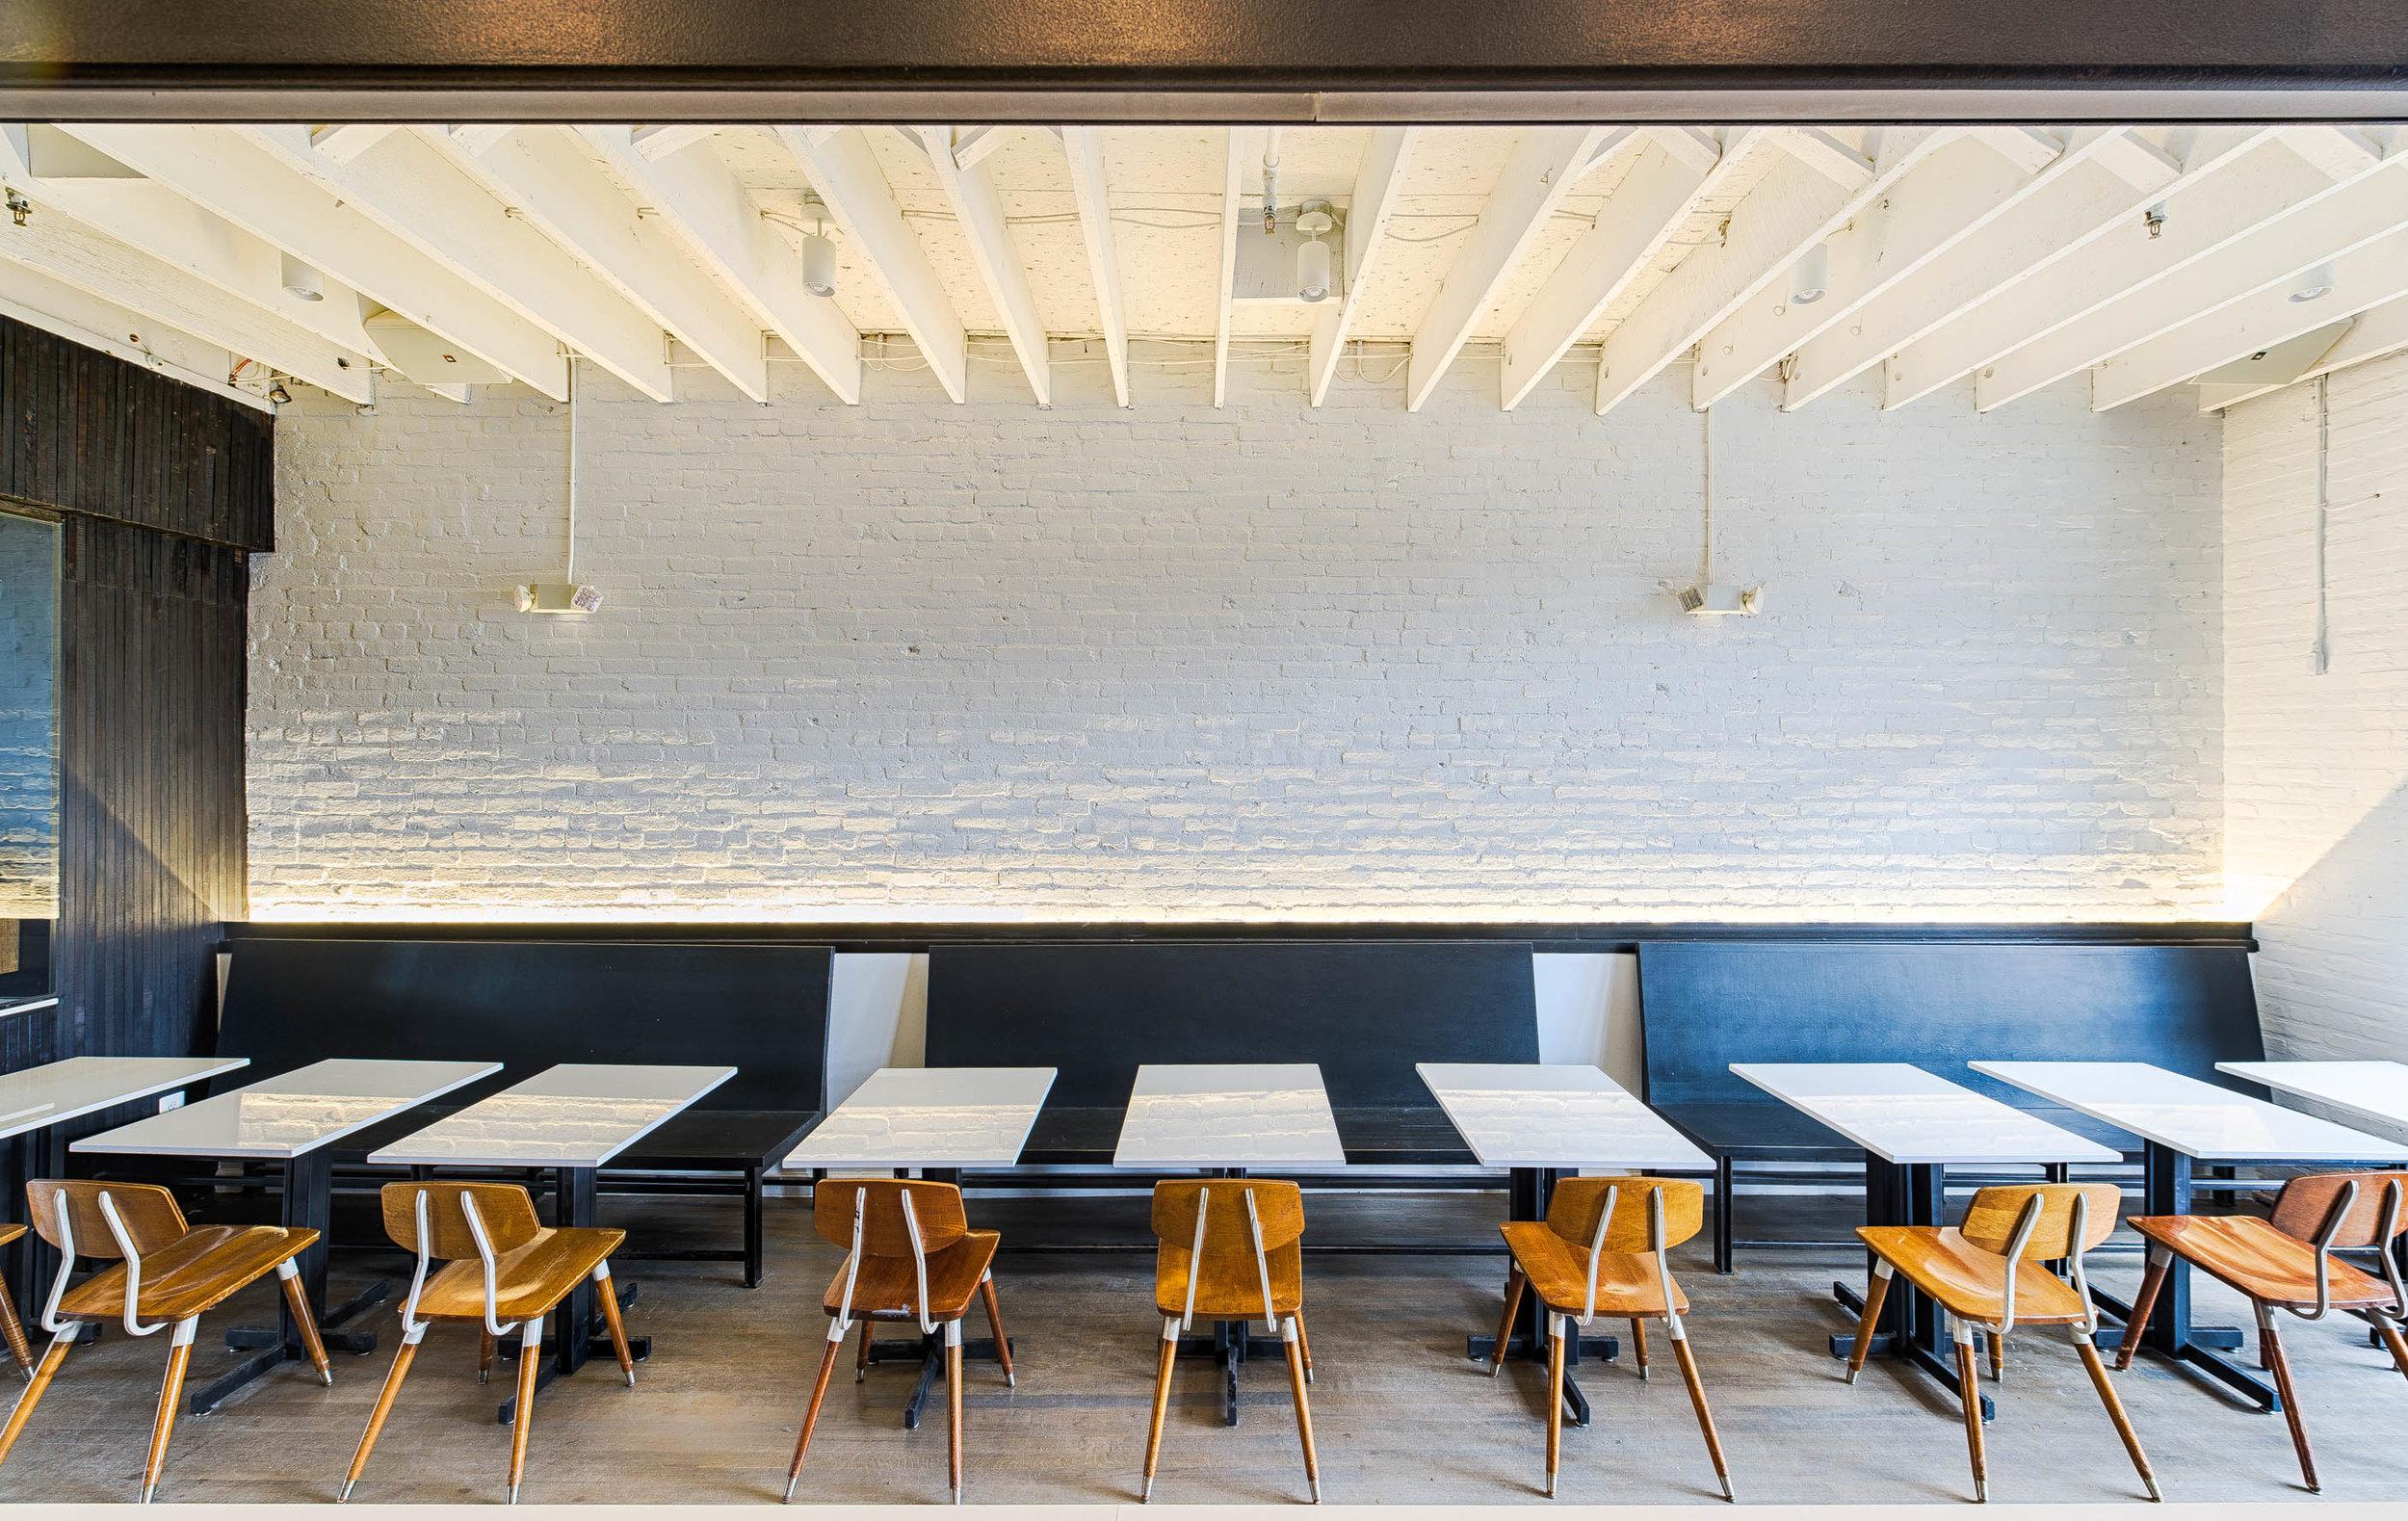 studio-saint-bars-and-restaurants-maketto-washington-dc-2